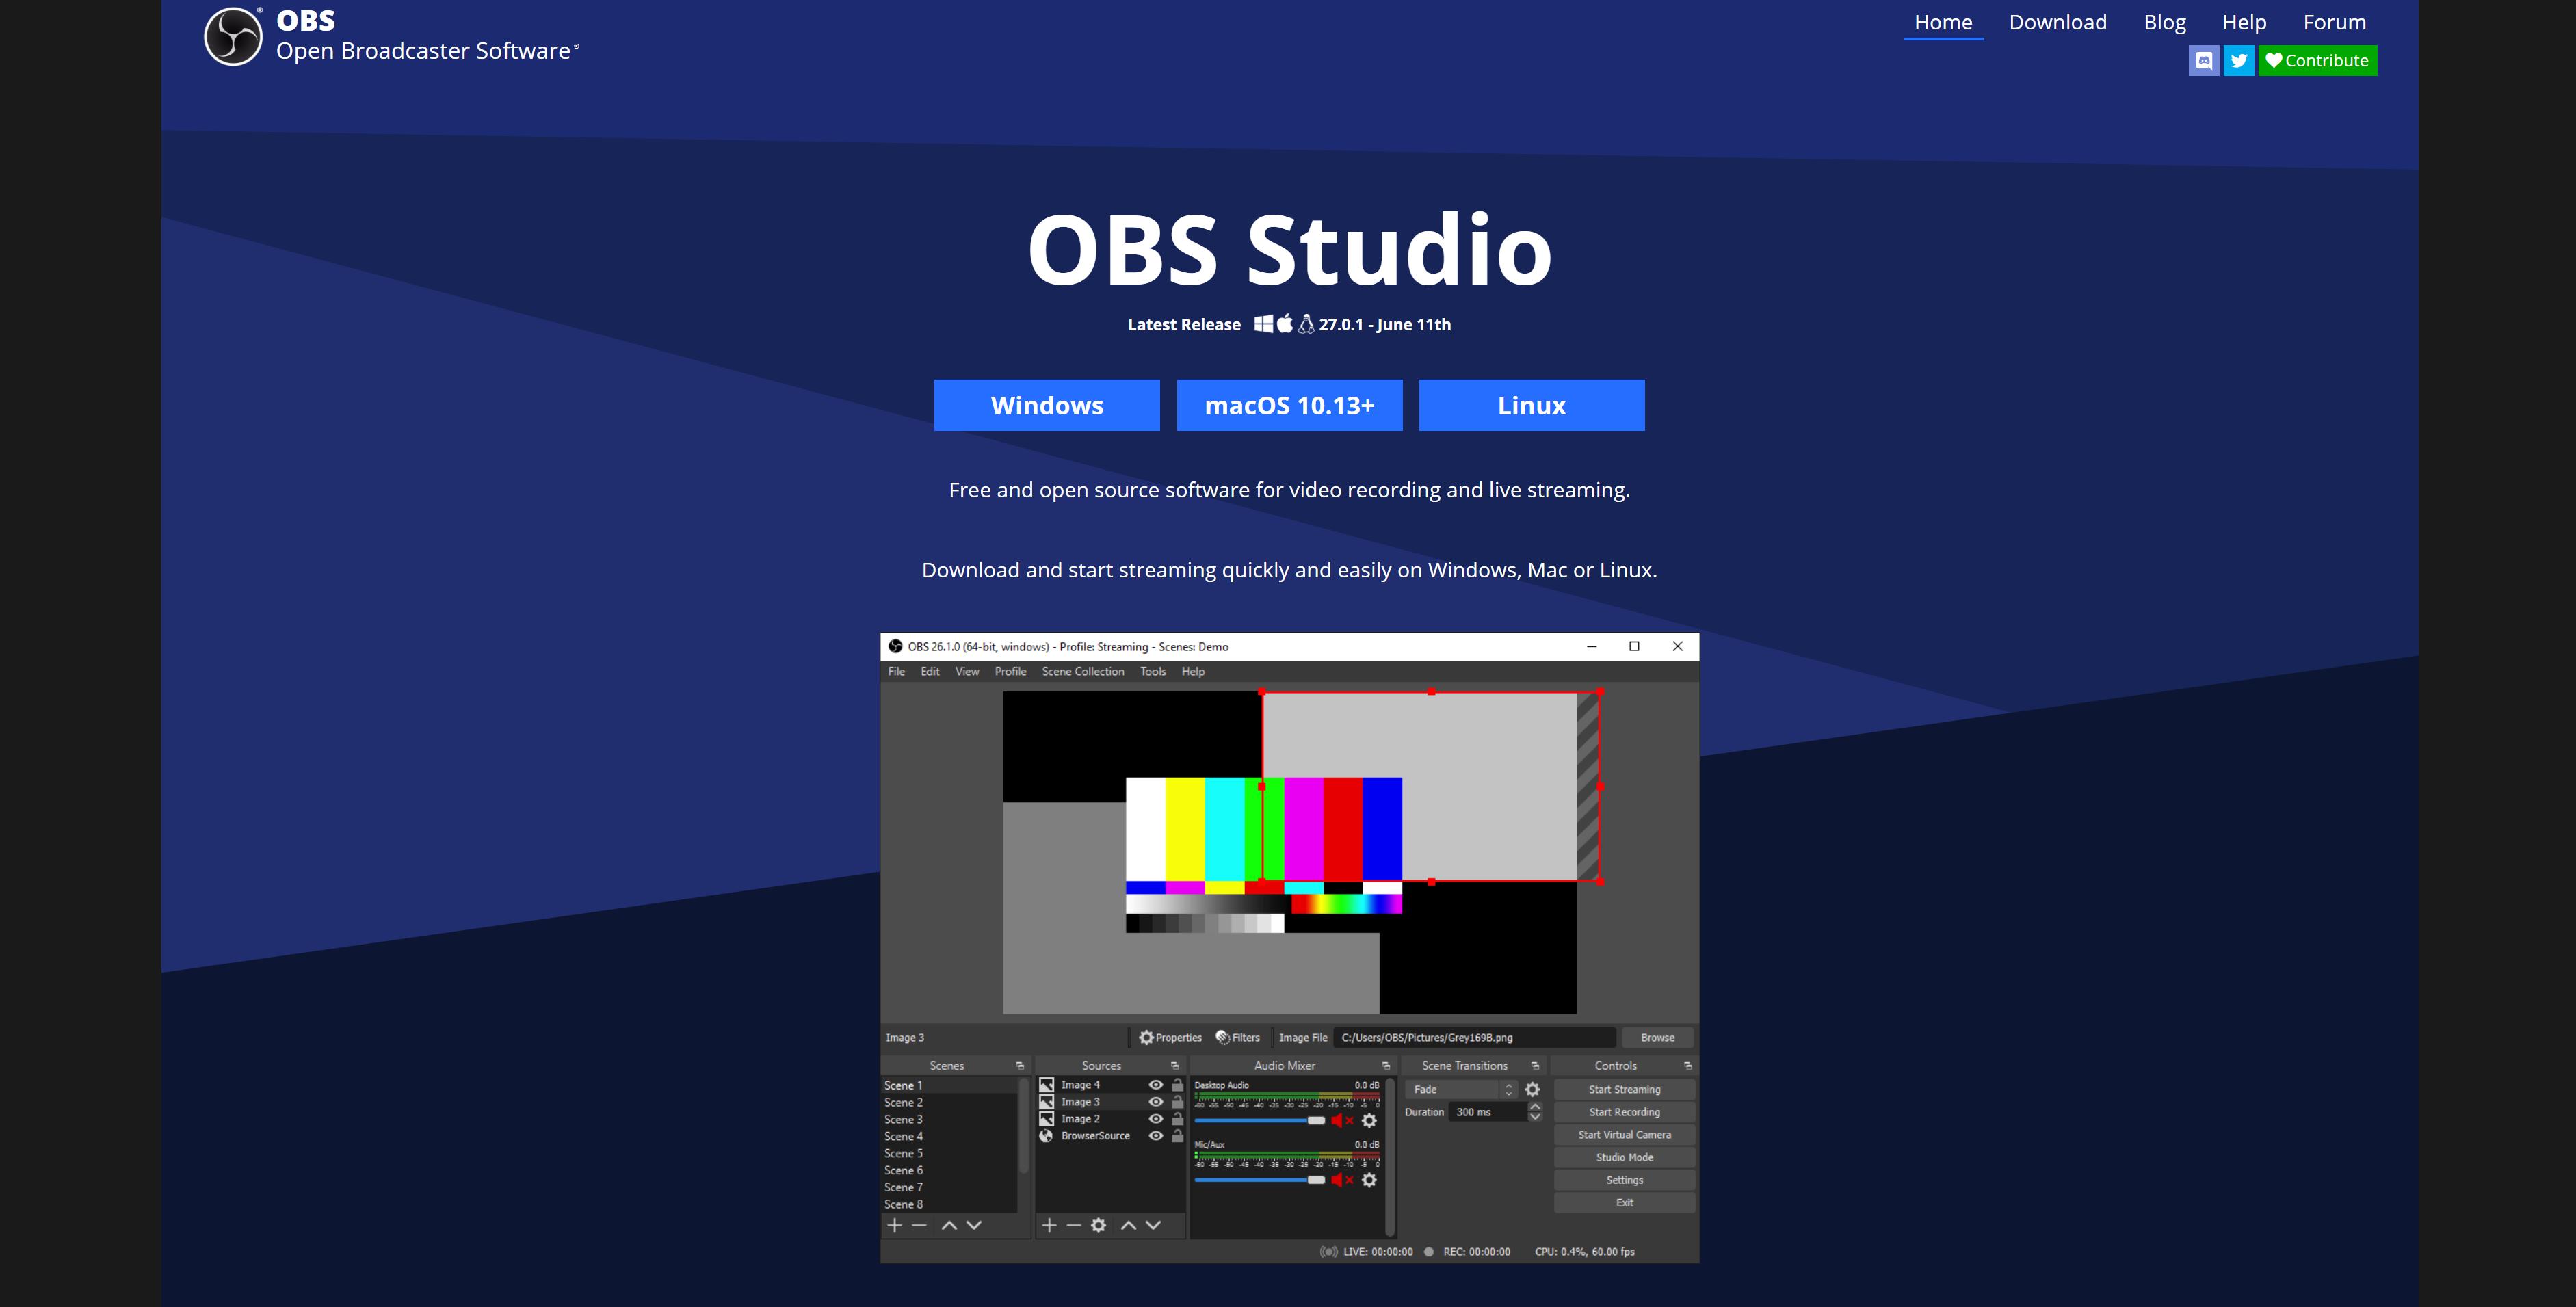 ons-studio-sg-branding-01